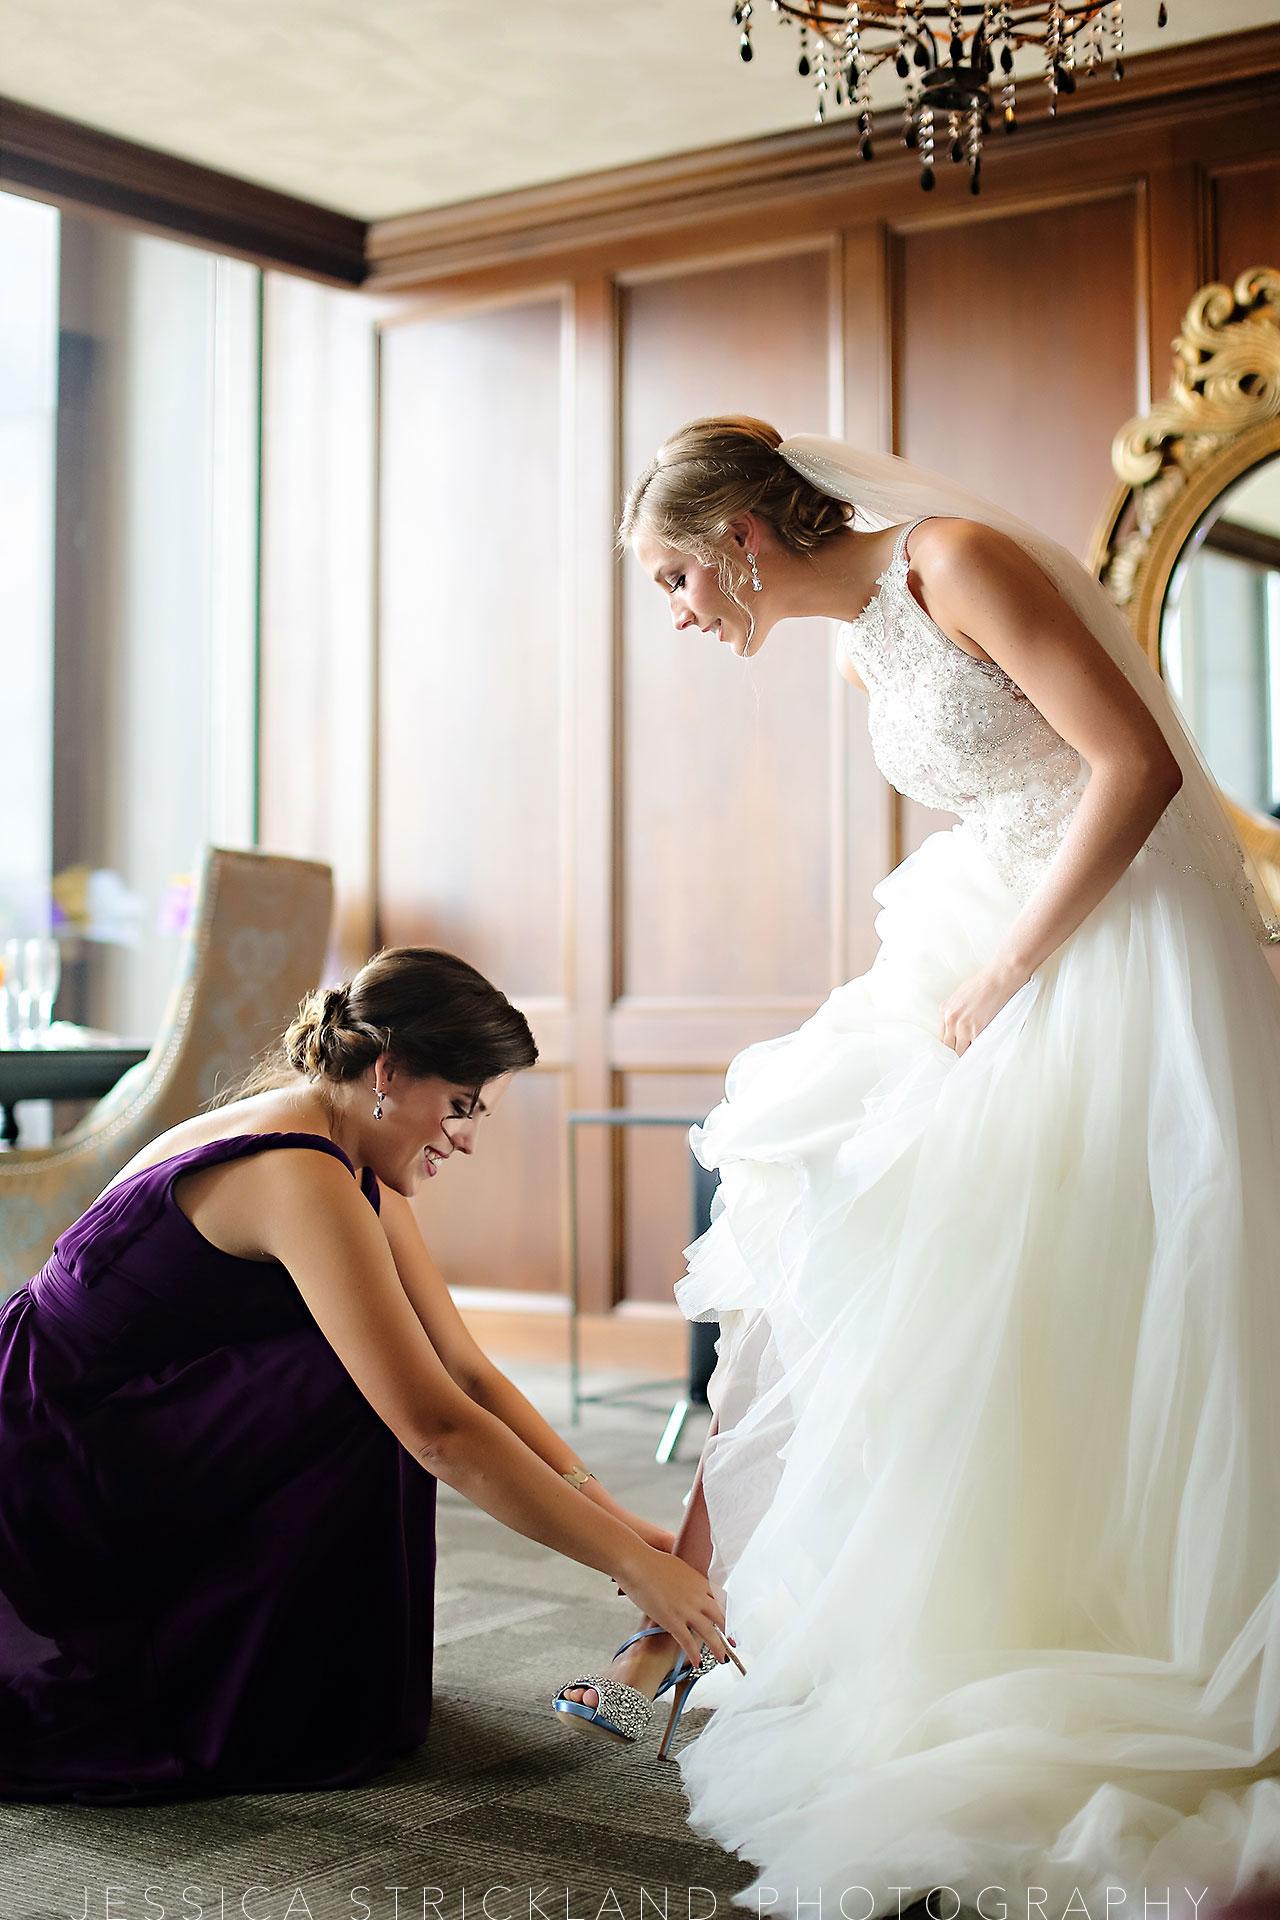 Serra Alex Regions Tower Indianapolis Wedding 062 watermarked